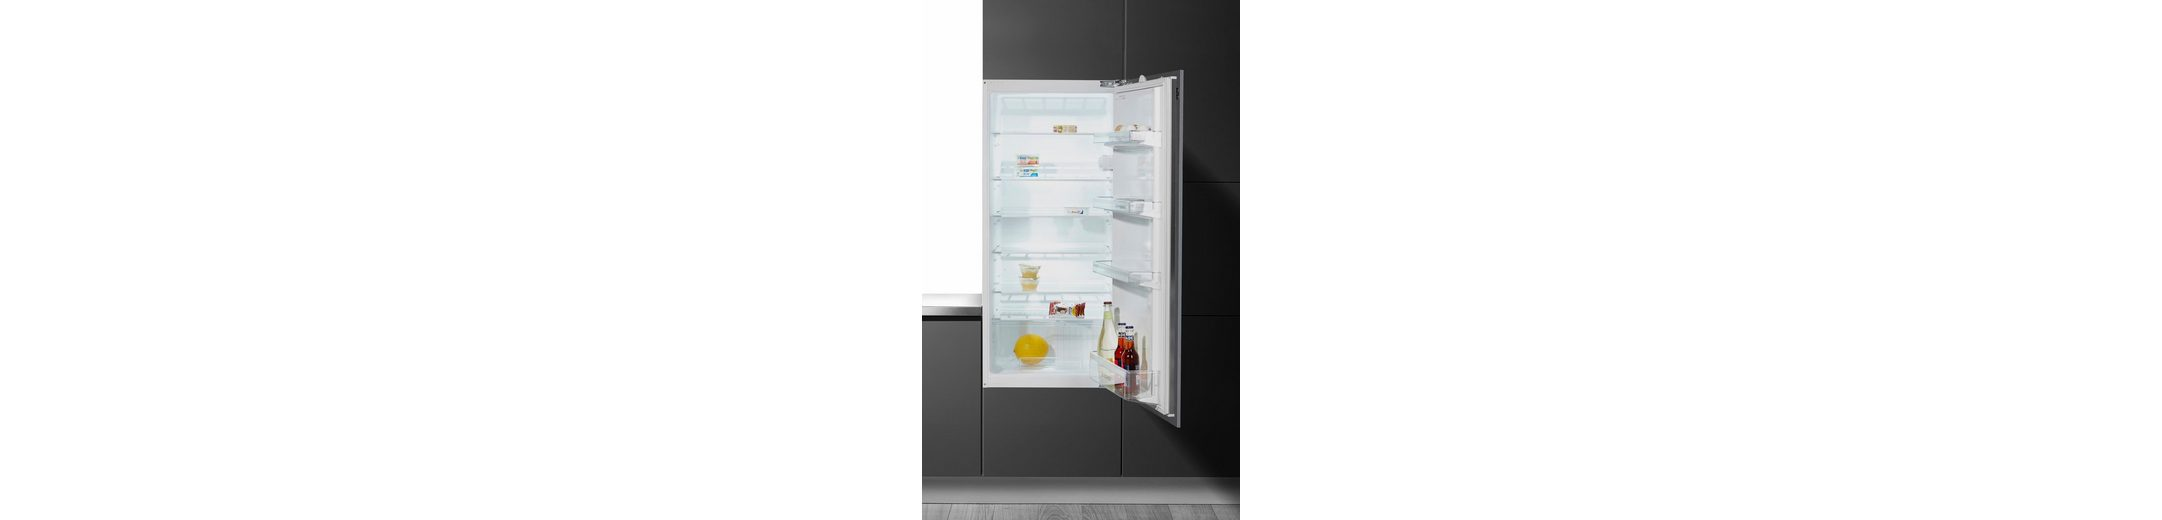 Bosch integrierbarer Einbau-Kühlschrank KIR24V60, A++, 122,5 cm